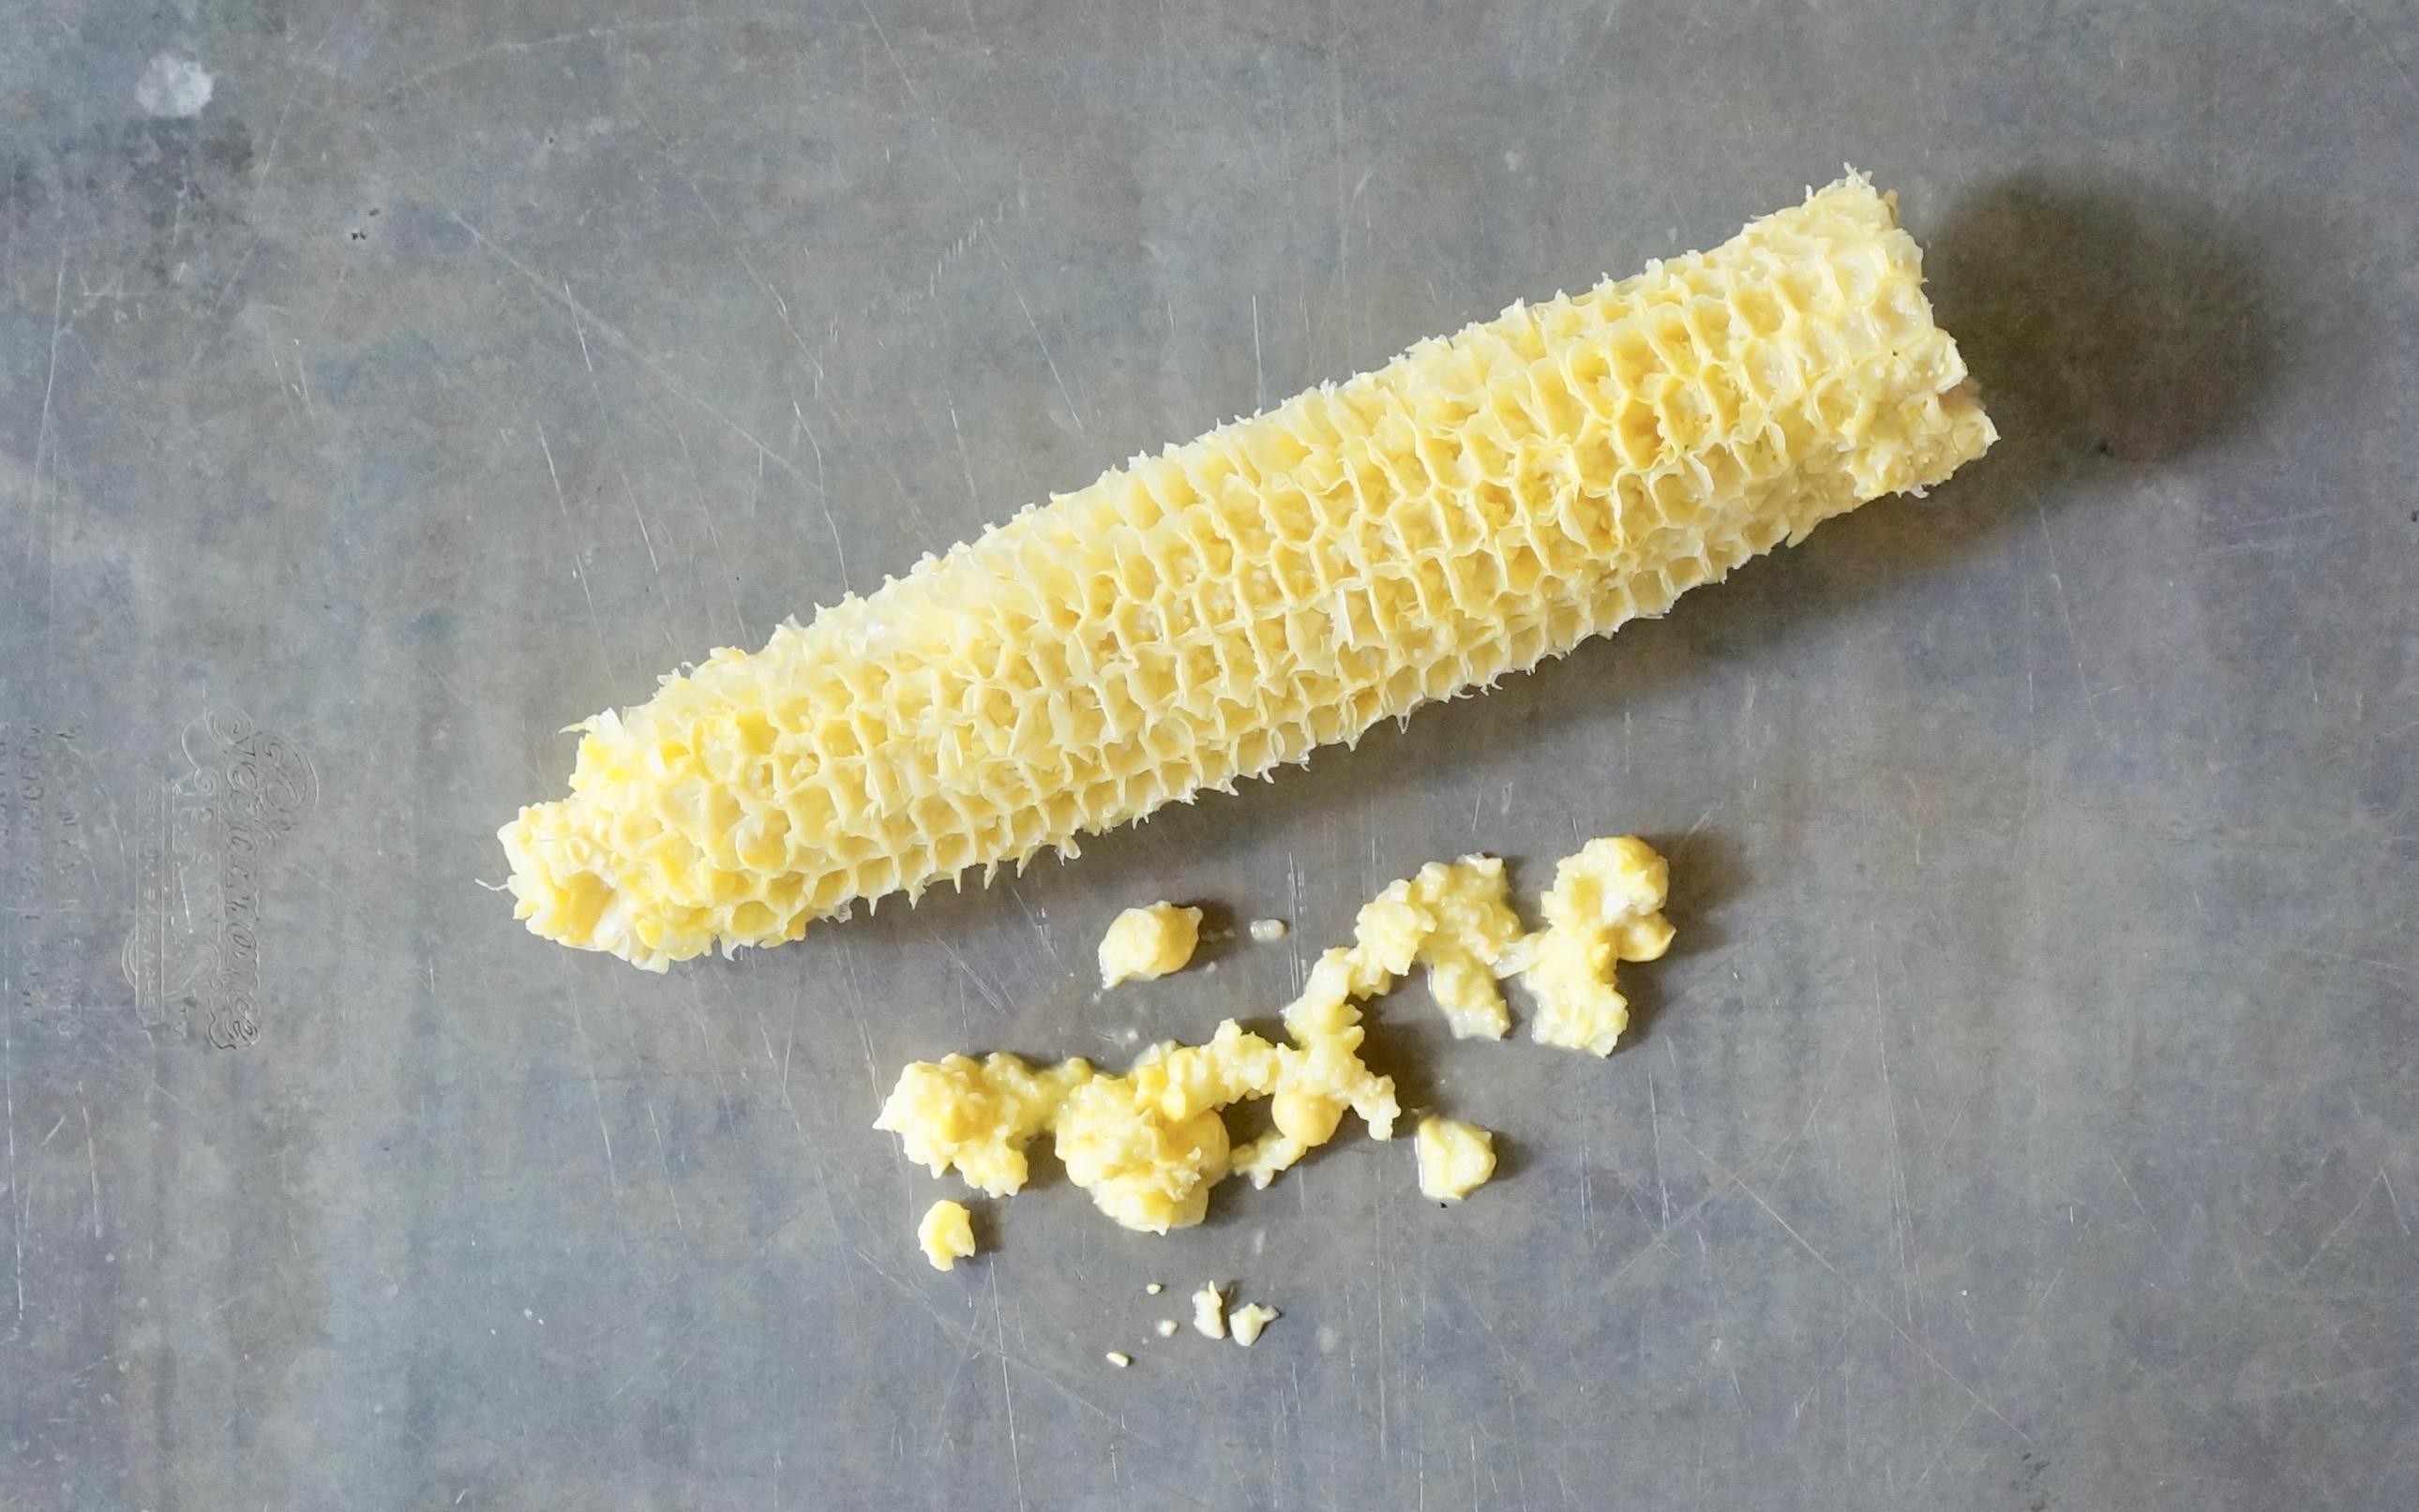 How-Do-You-Remove-The-Milk-From-Corn-Cobs-Rebecca-Gordon-Editor-In-Chief-Buttermilk-Lipstick-Culinary-Entertaining-Techniques-Southern-Hostess-RebeccaGordon-Pastry-Chef-Birmingham-Alabama